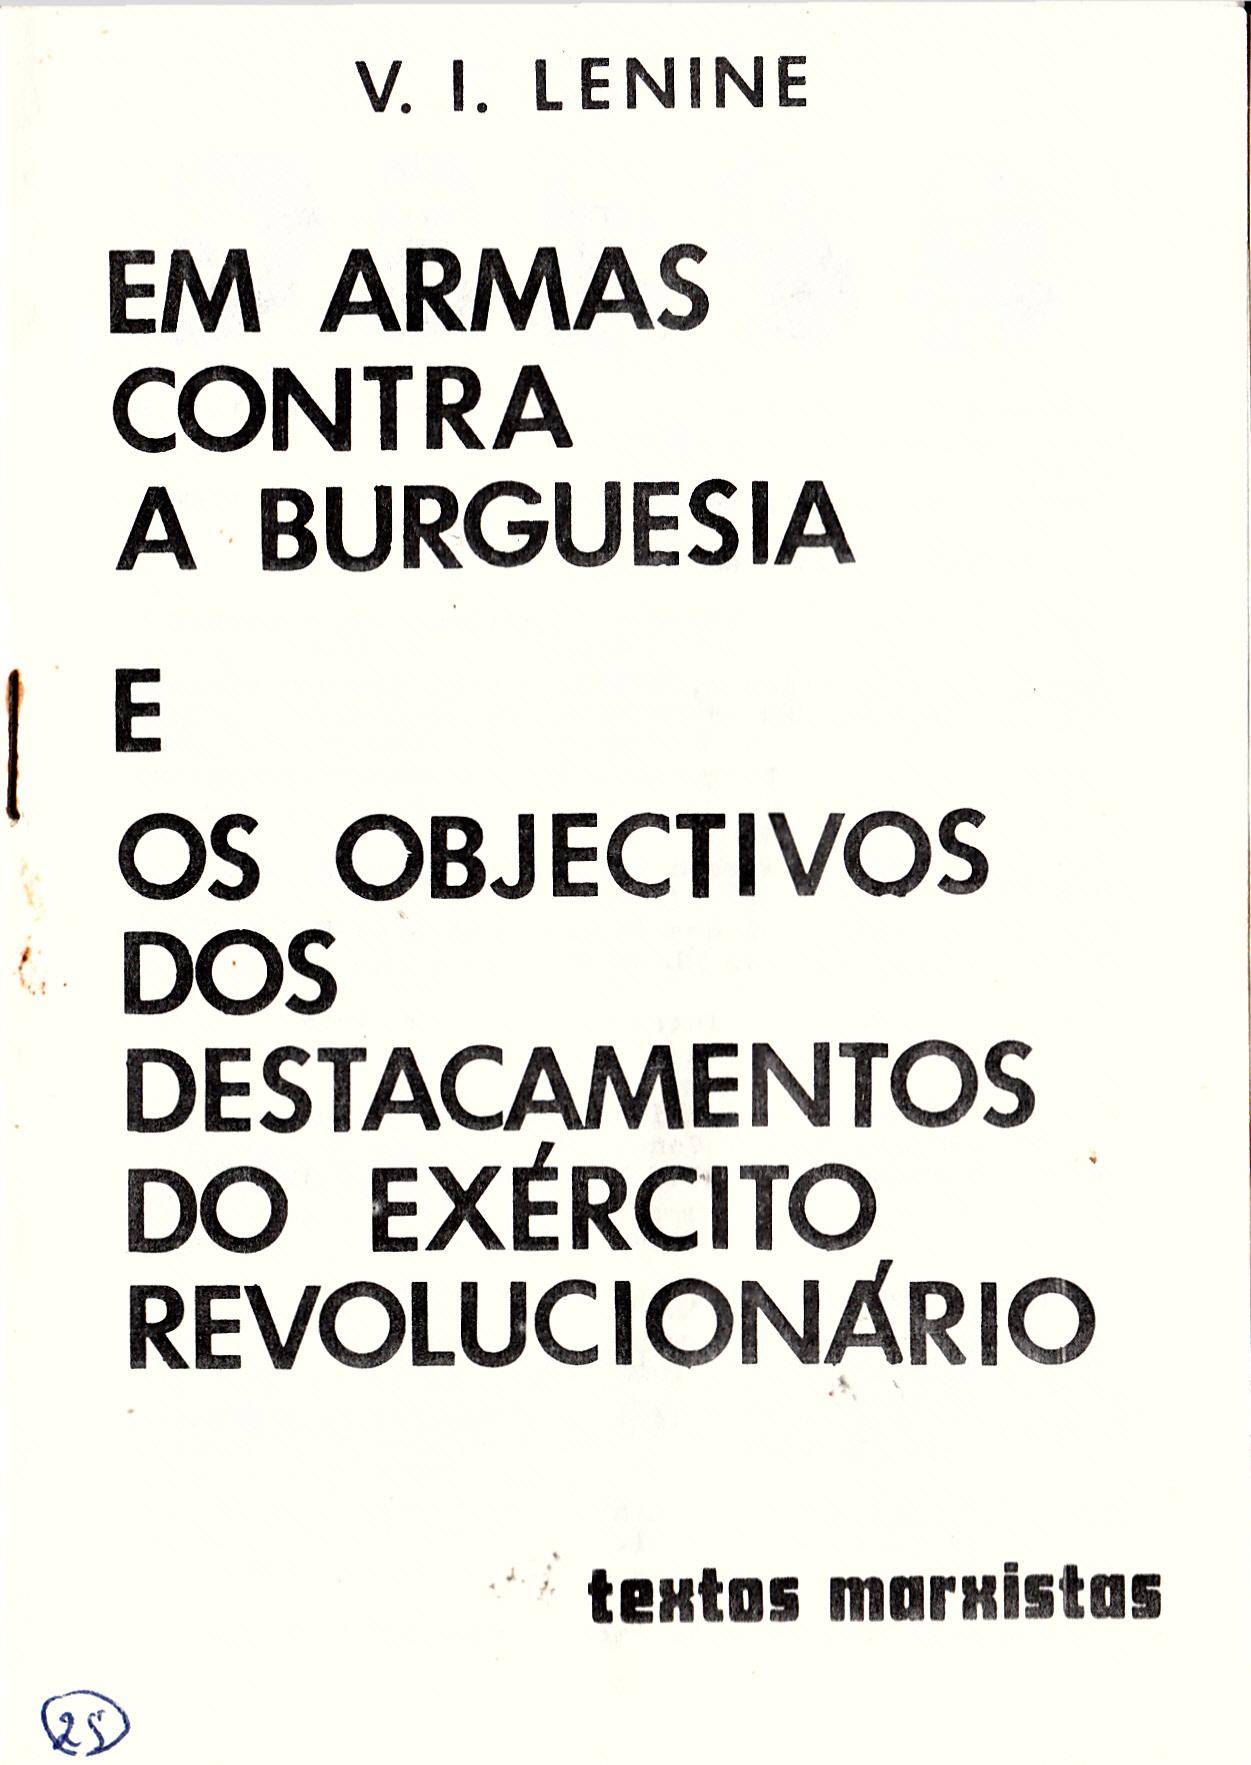 Textos_Marxistas_0004